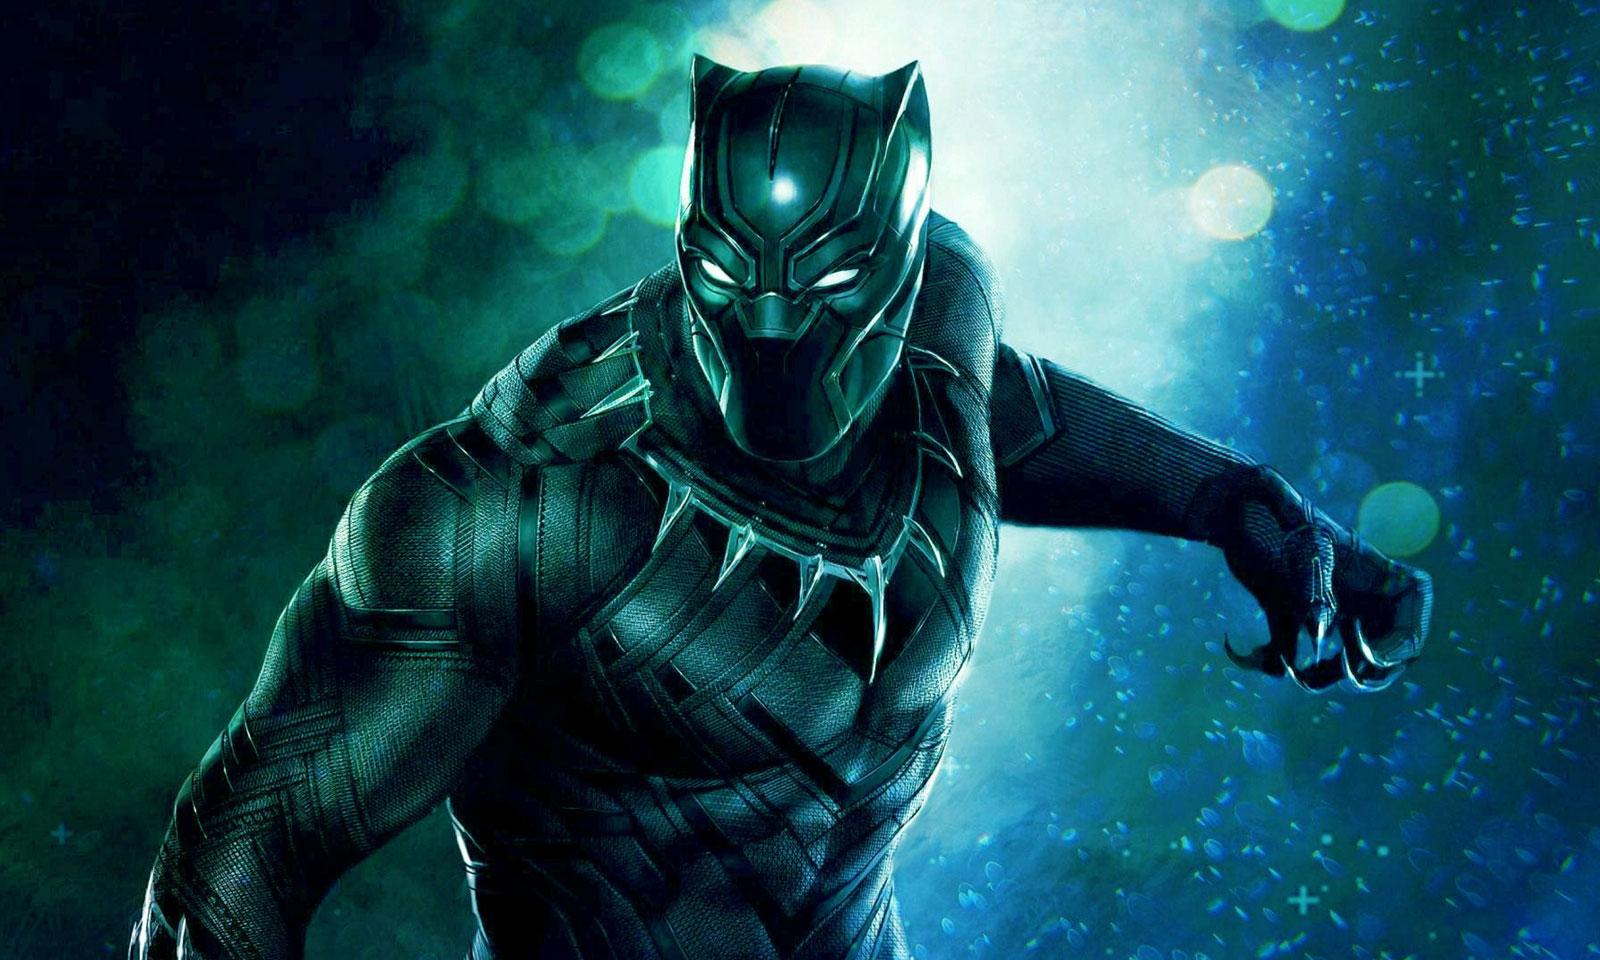 Črni panter, Black Panther, film, oskarji, oskar, Oscar